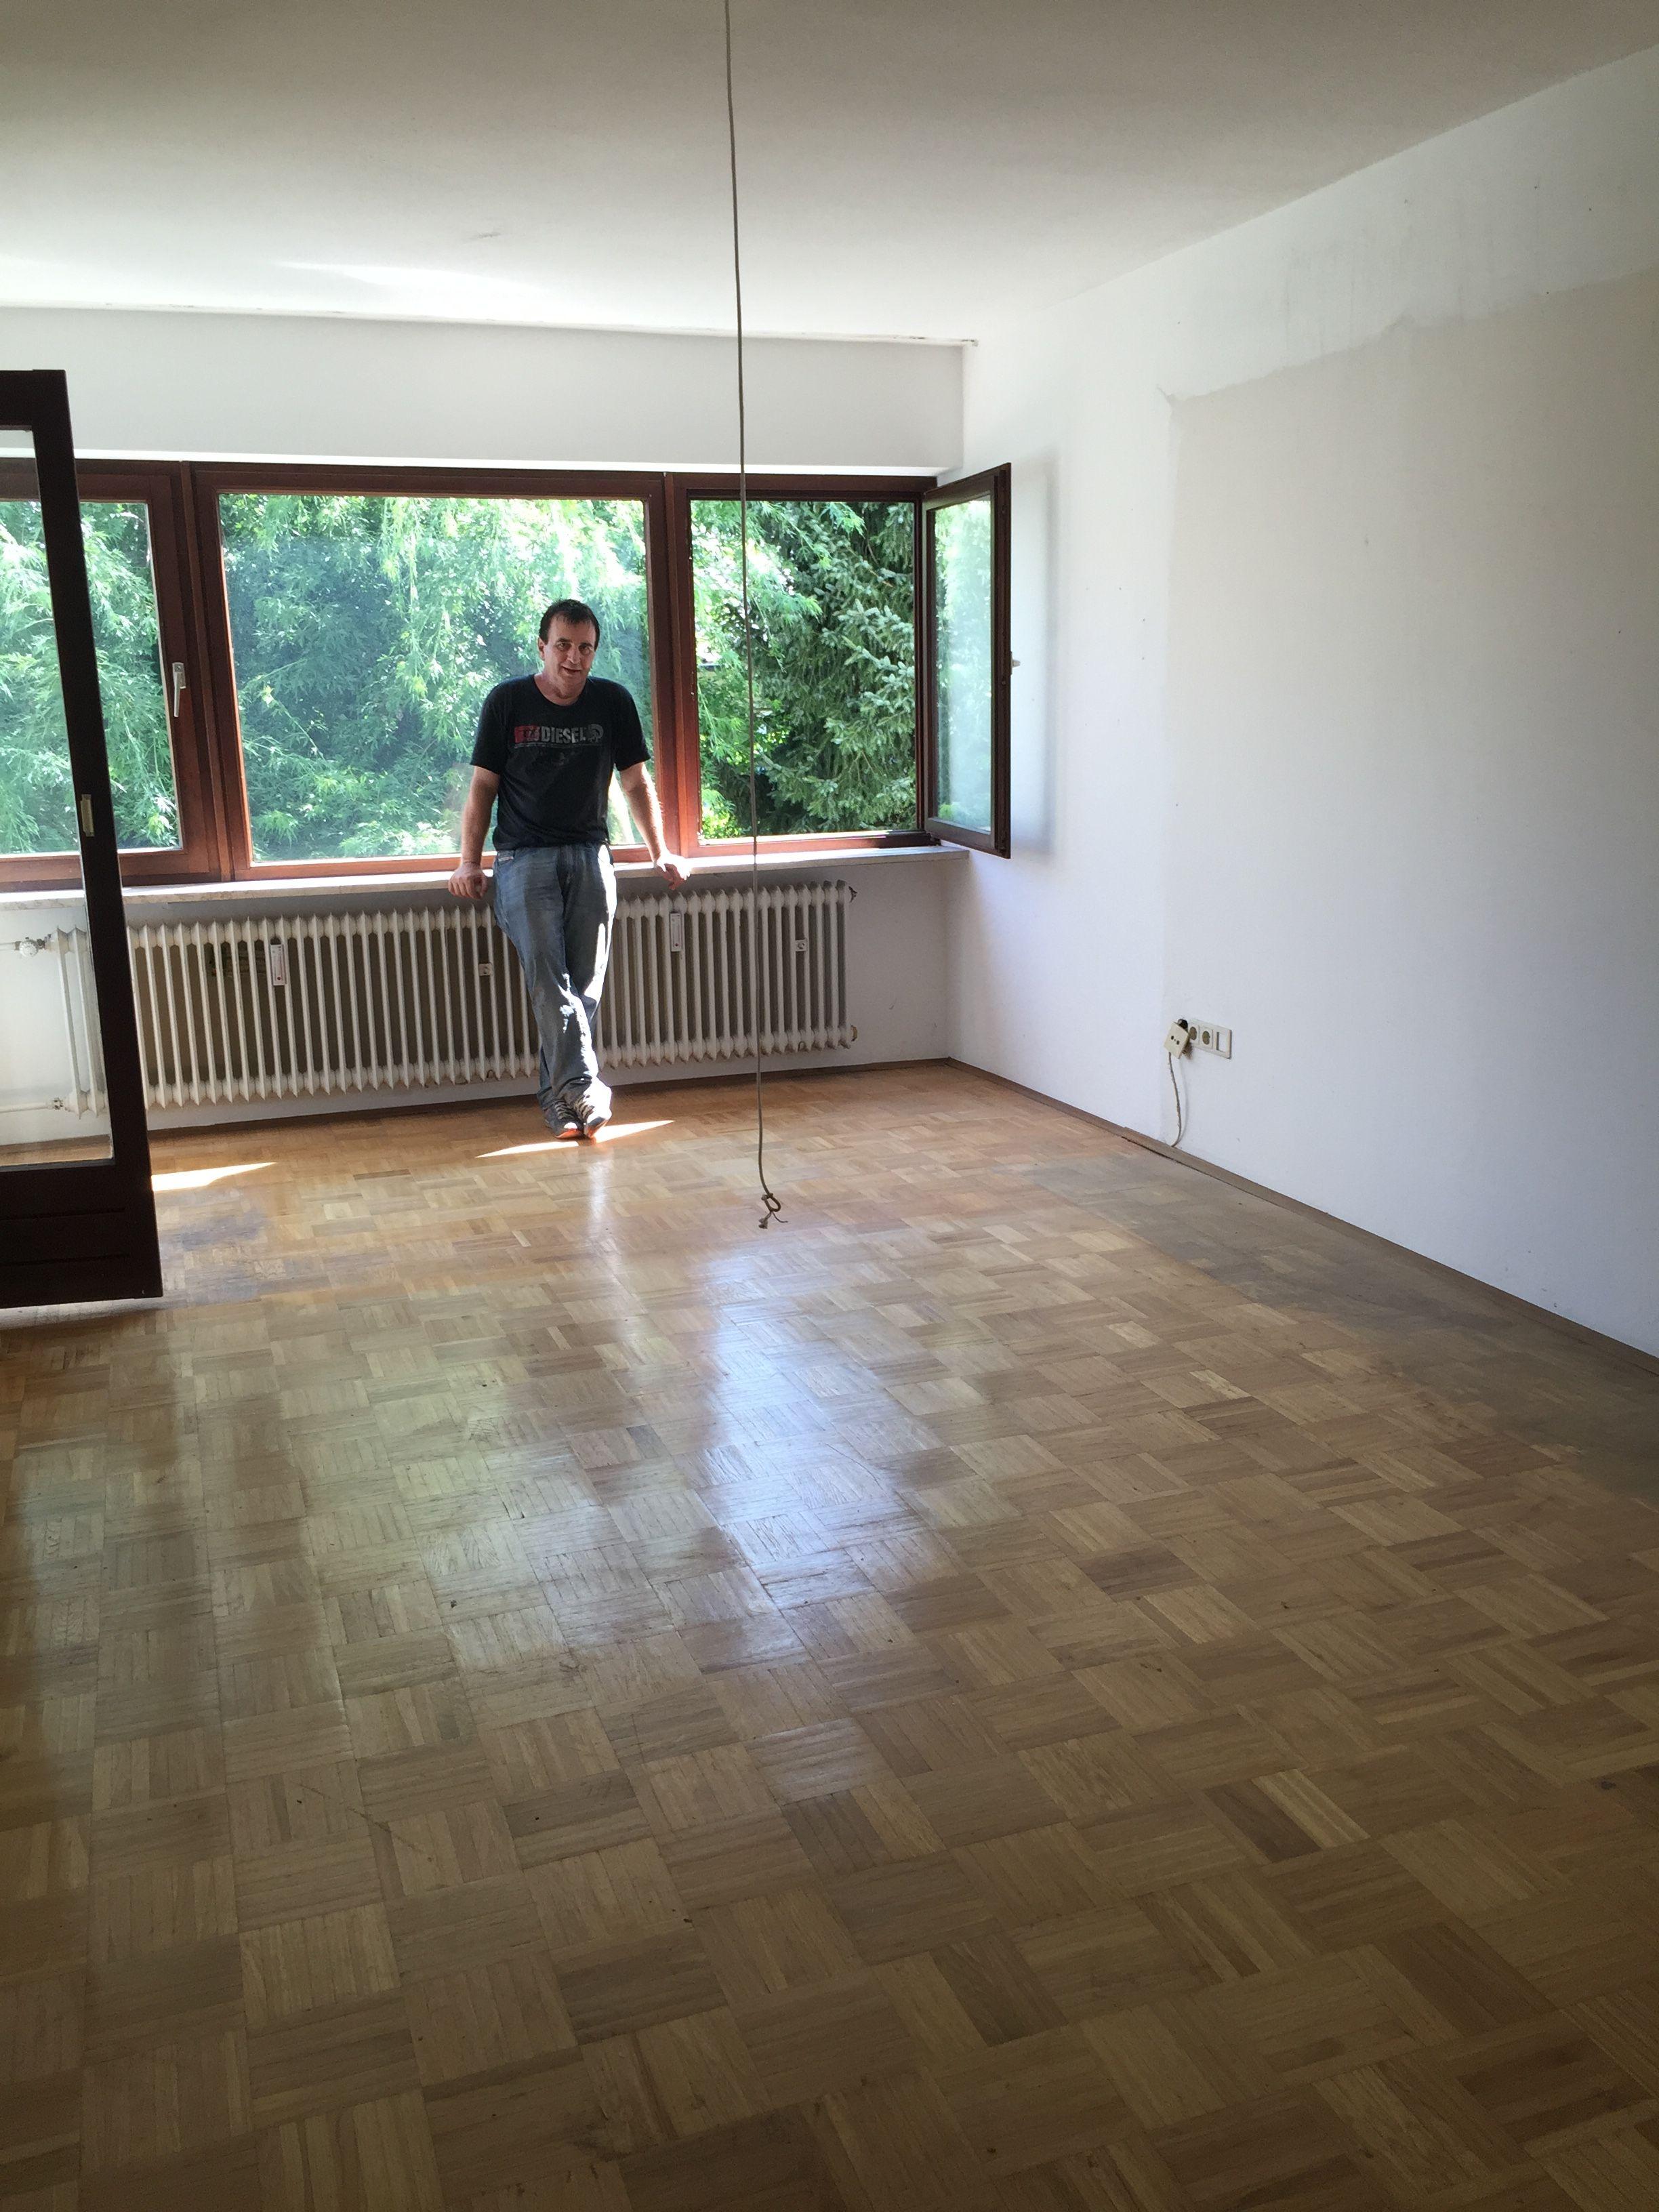 Haushaltsauflösung München Gerhard Mößlacher 08945247617